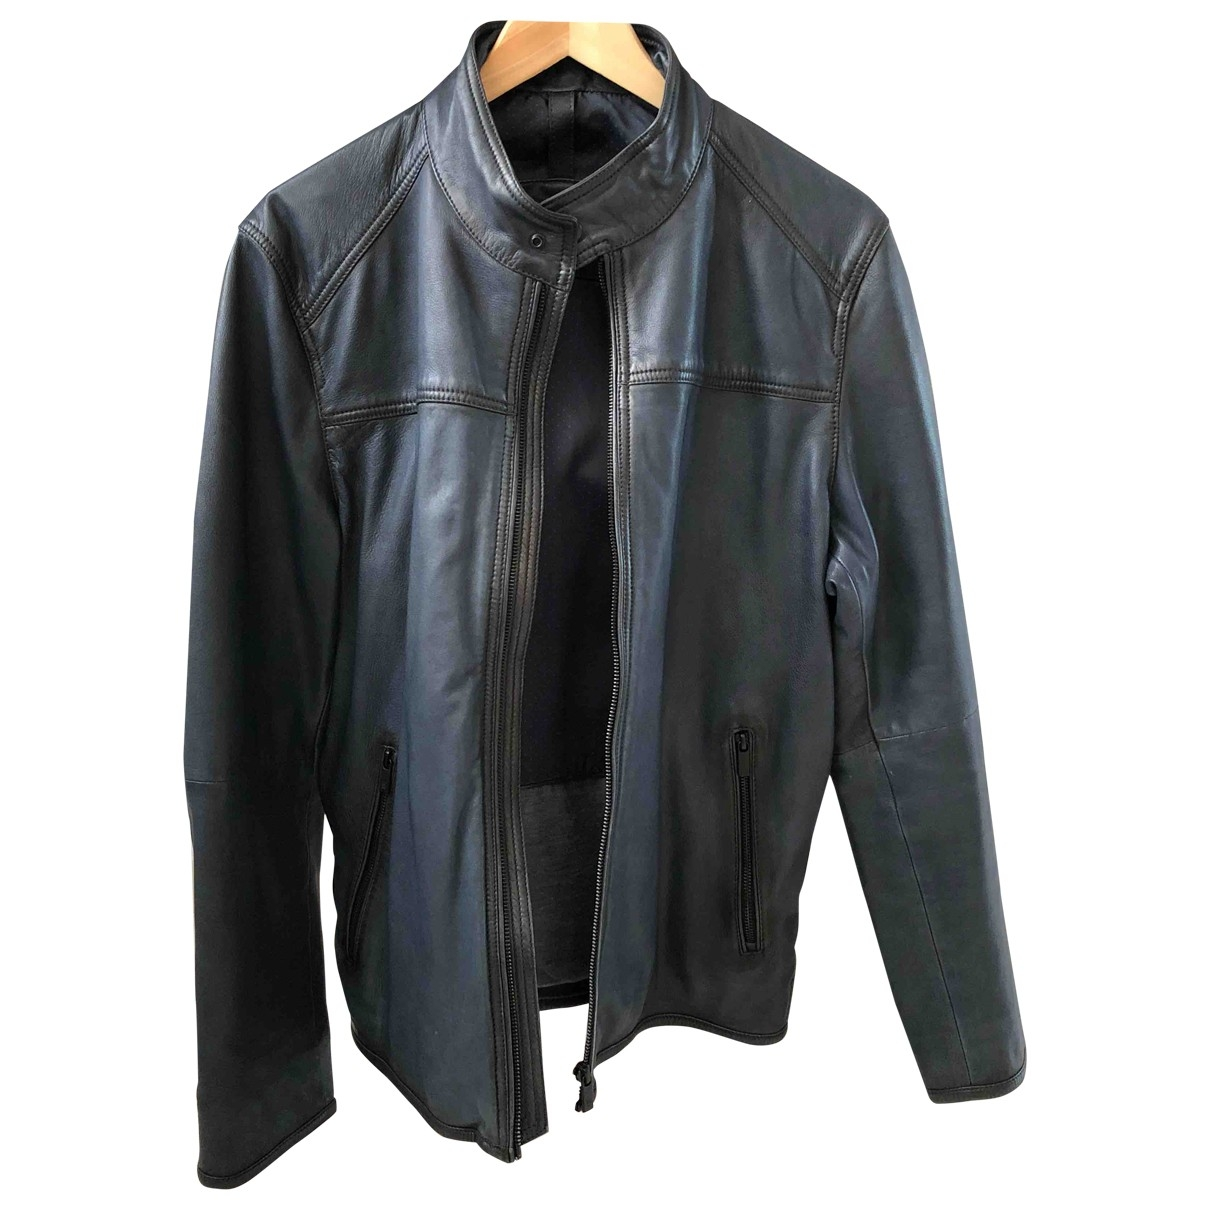 Massimo Dutti \N Blue Leather jacket  for Men L International